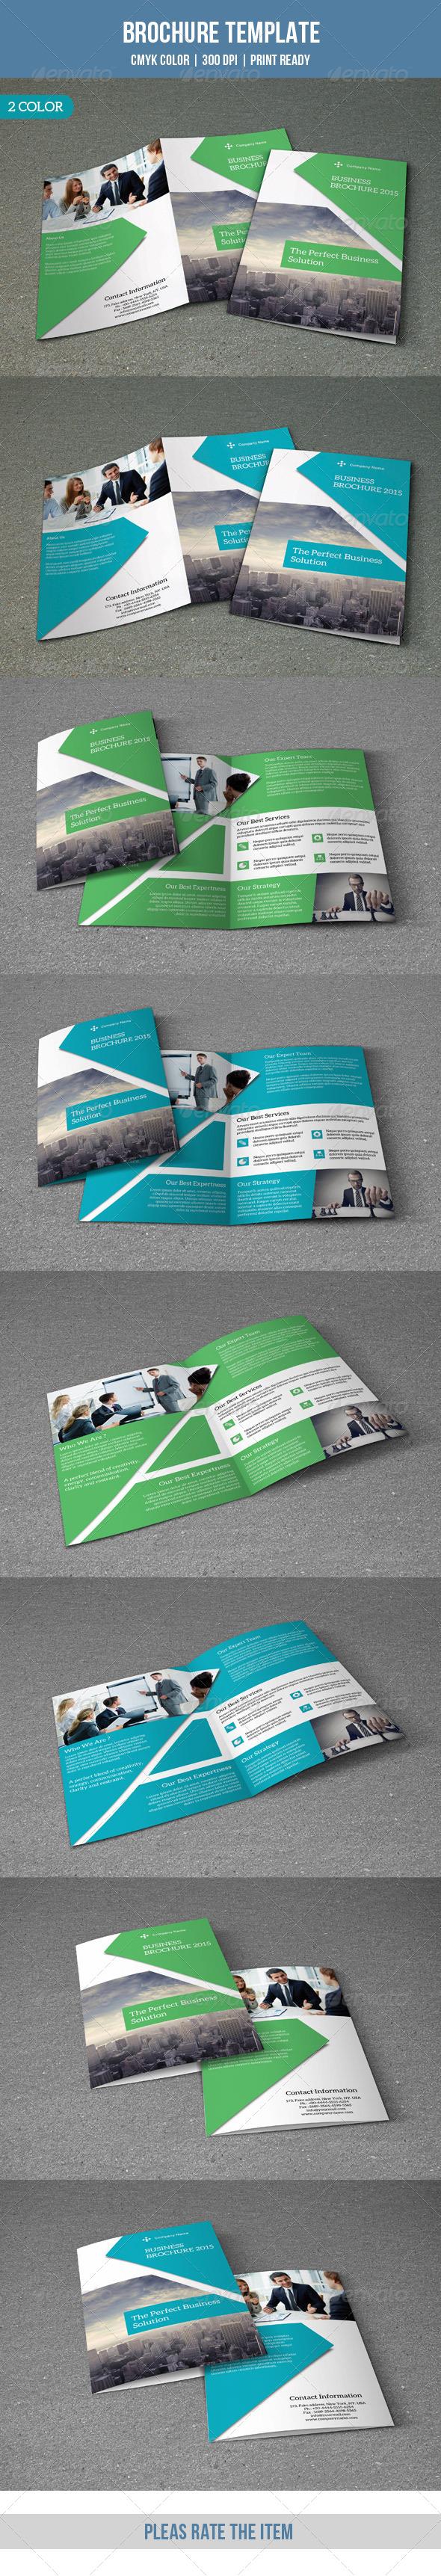 GraphicRiver Bifold Business Brochure-V123 8777143